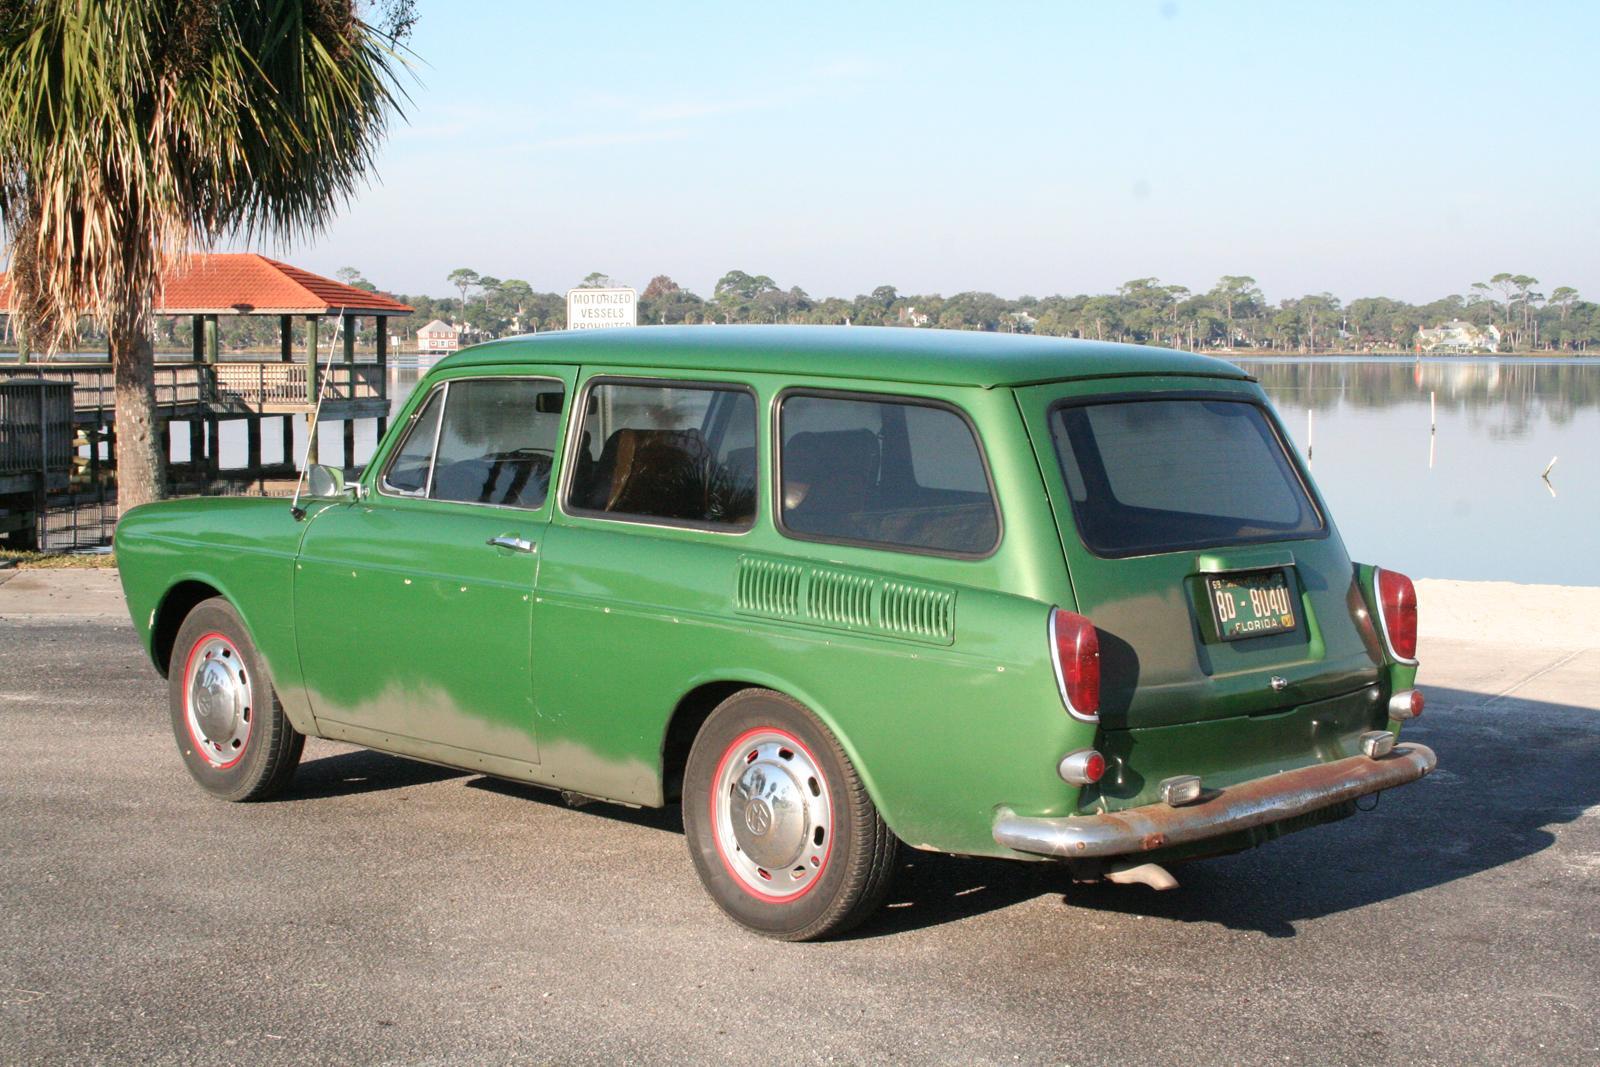 1969 Squareback with Sunroof